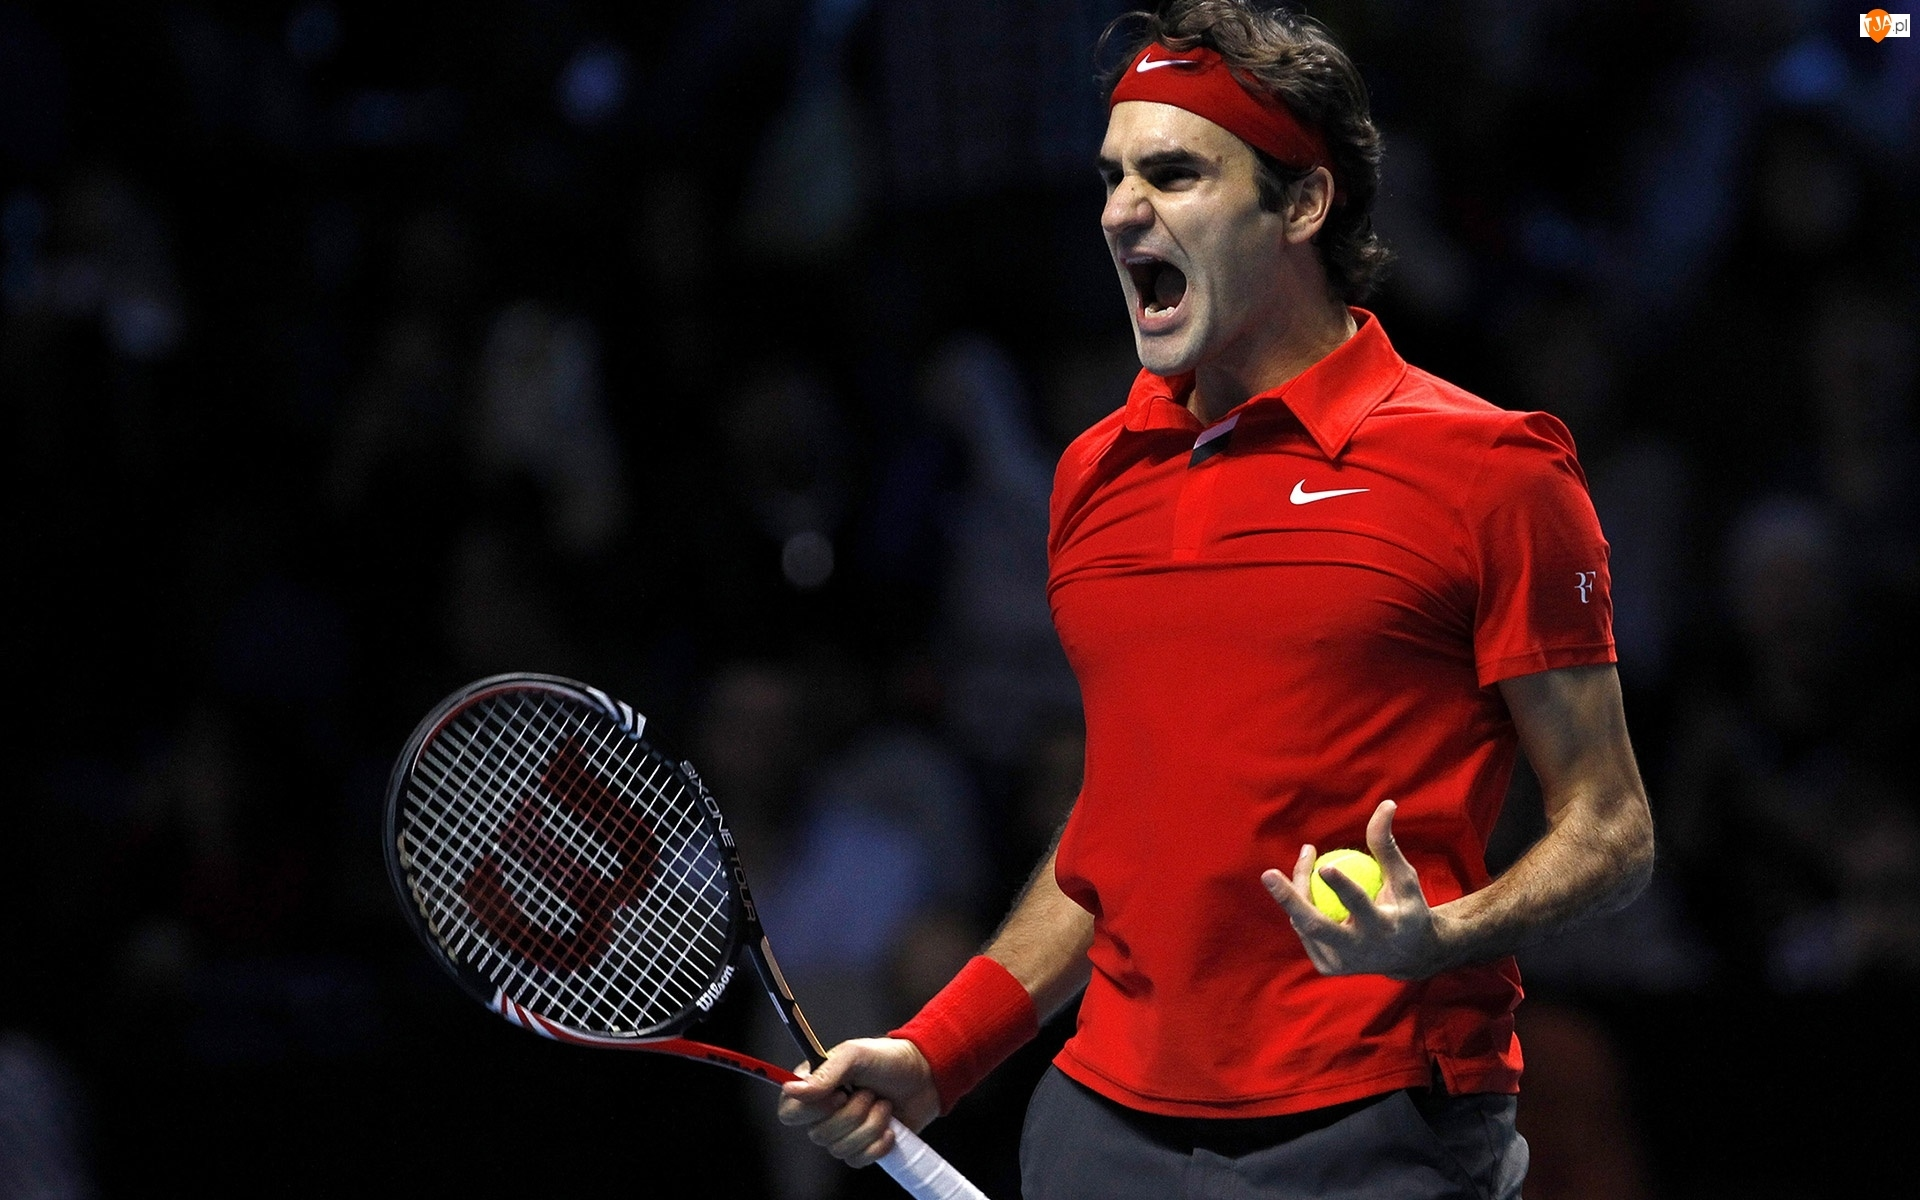 Roger Federer, Szwajcarski, Tenisista